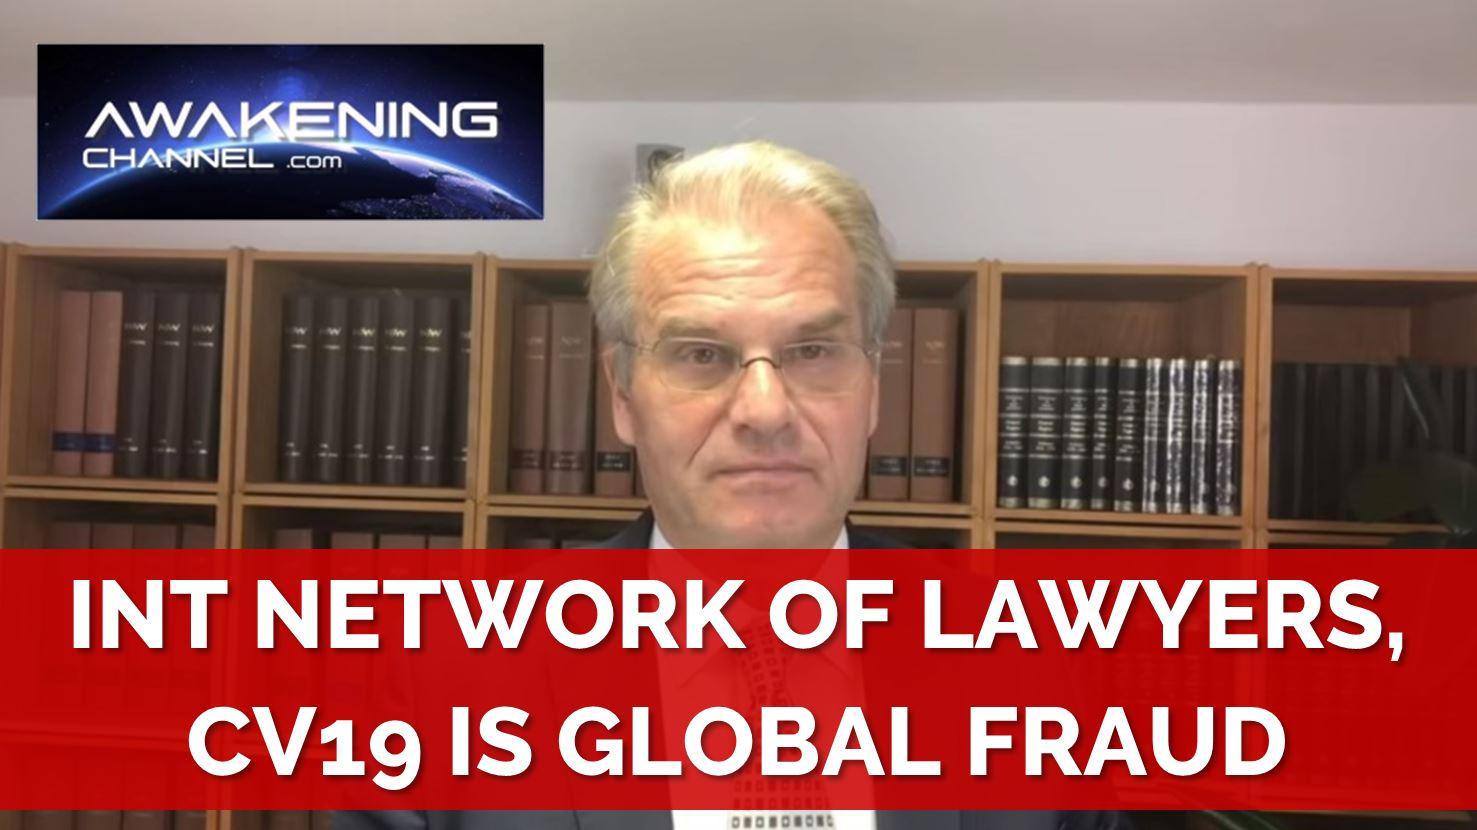 Awakening Channel: International Network of Lawyers, C19 is a Global Fraud